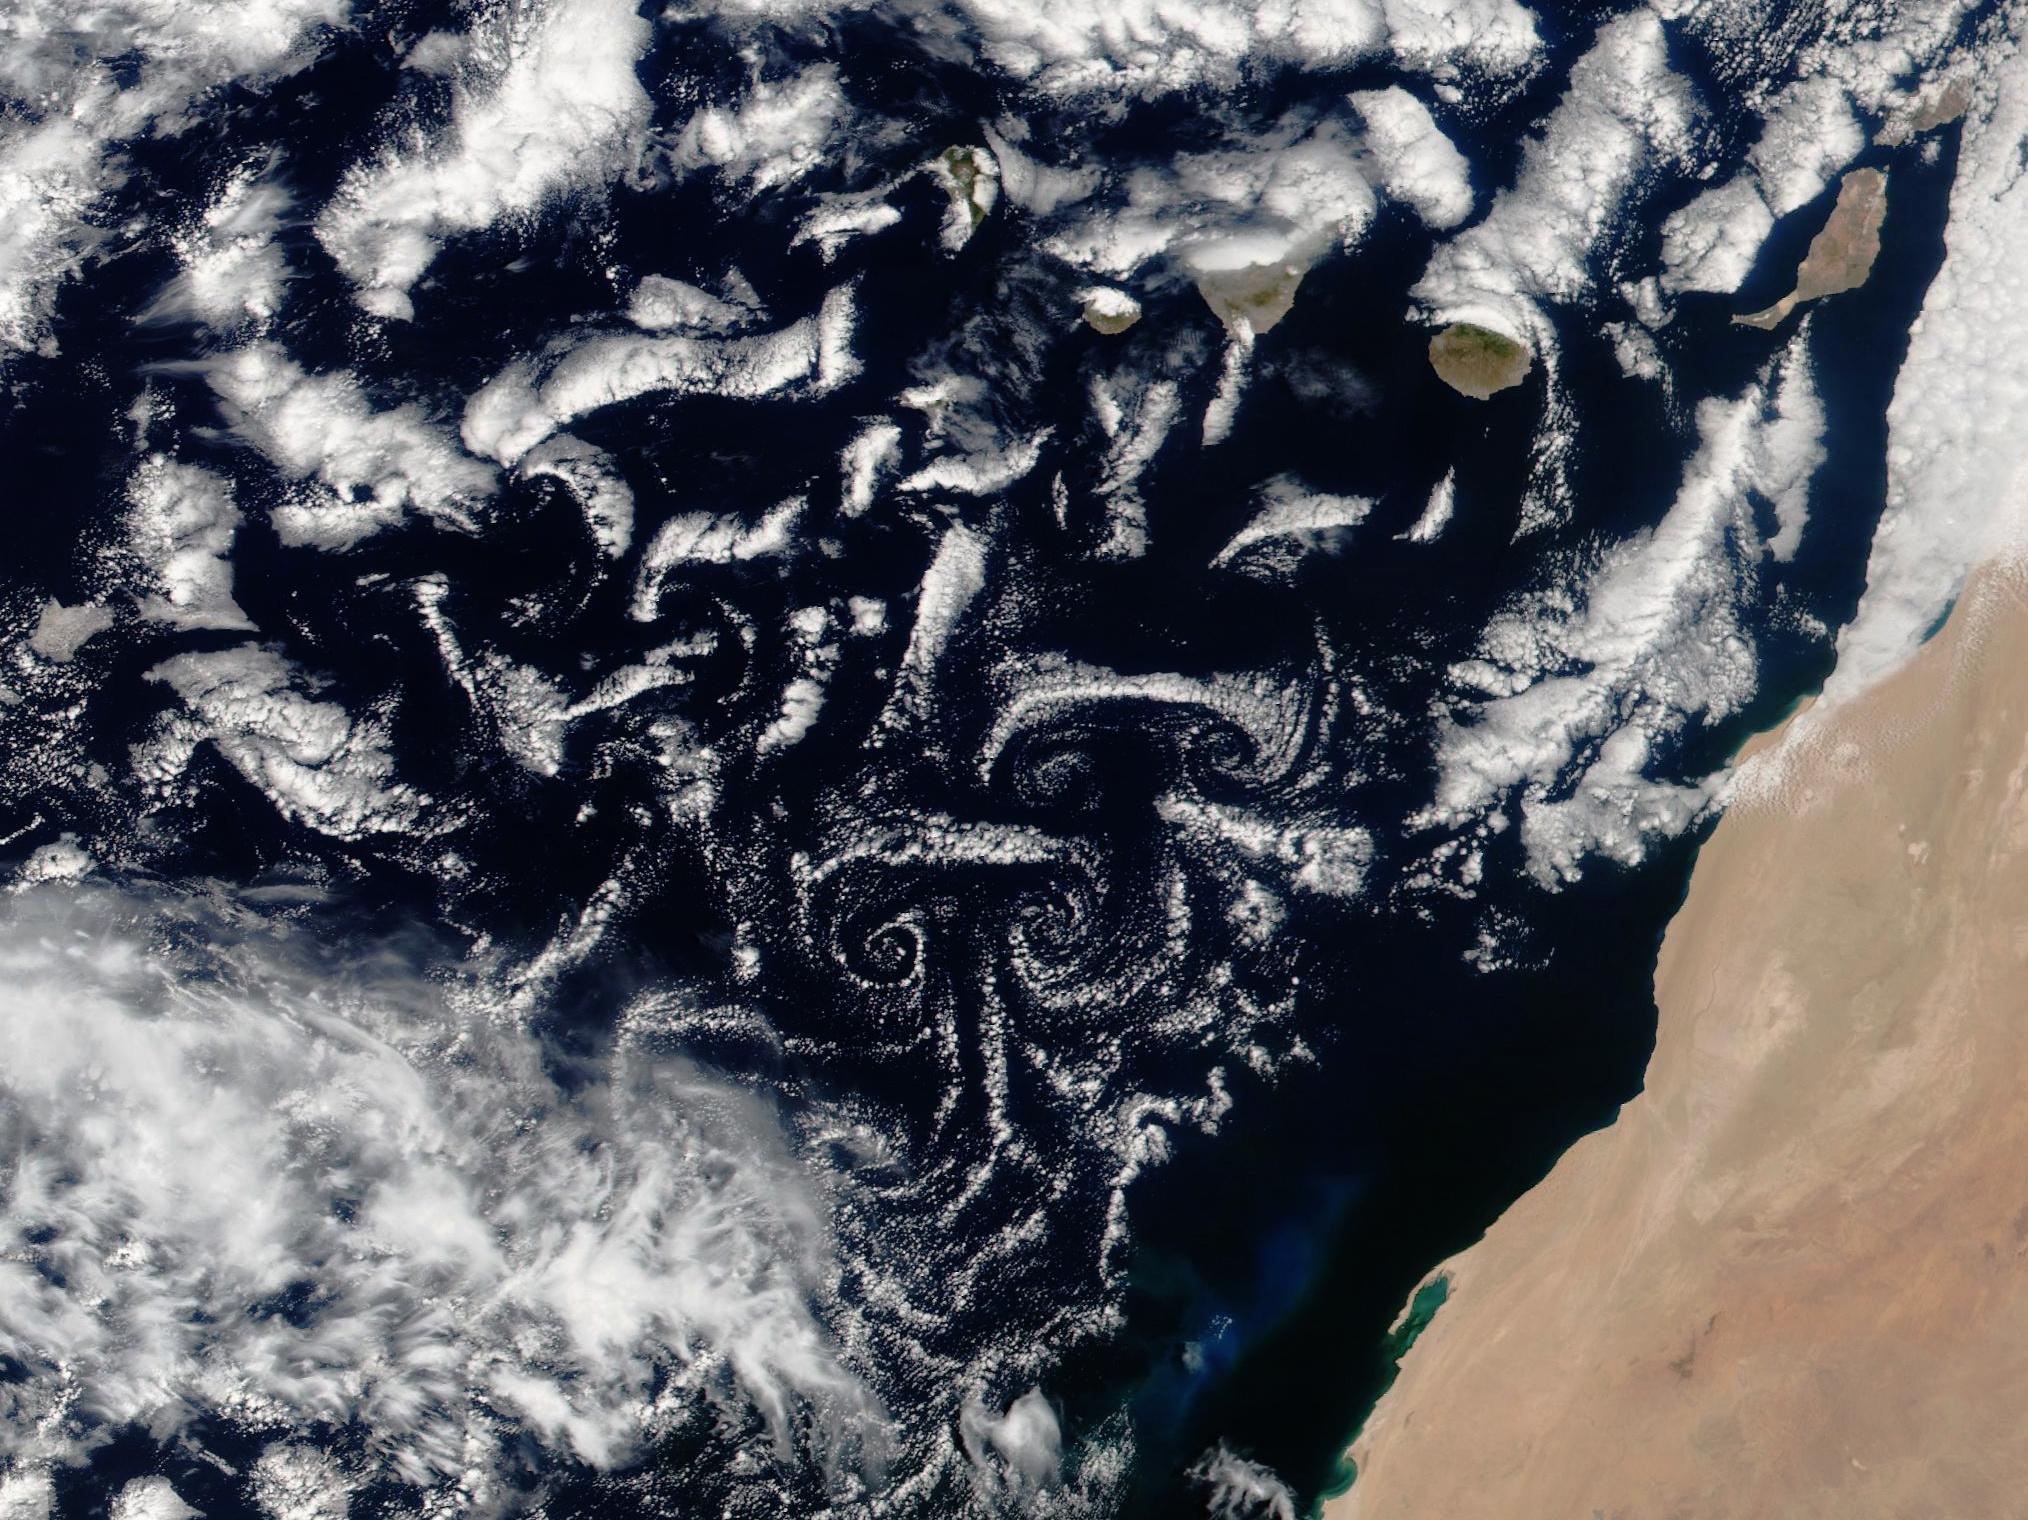 Allée de tourbillons de Bénard - Von Karman - Satellite - Canaries - Kármán vortex street